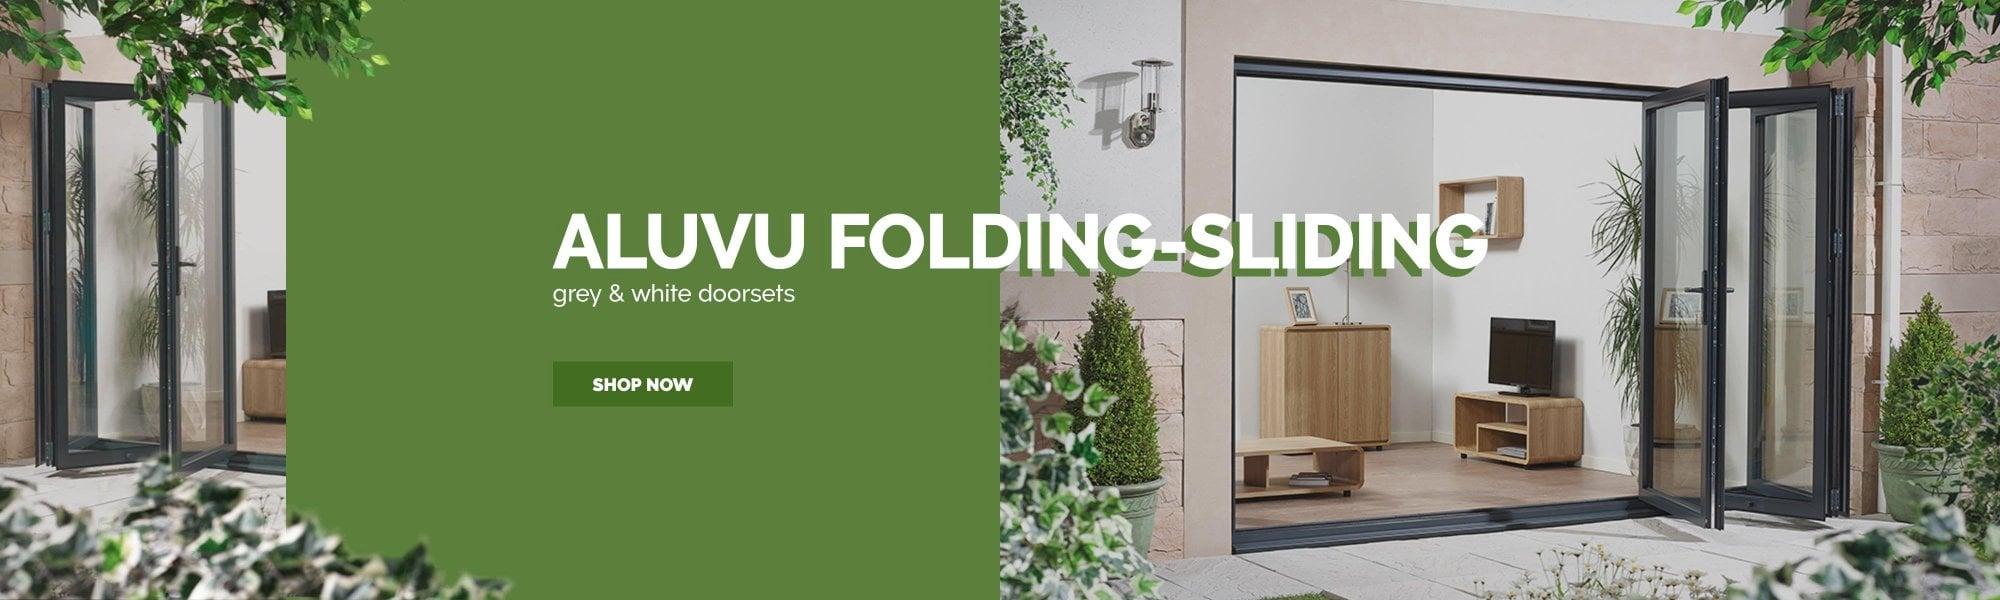 AluVu sliding-folding doorsets